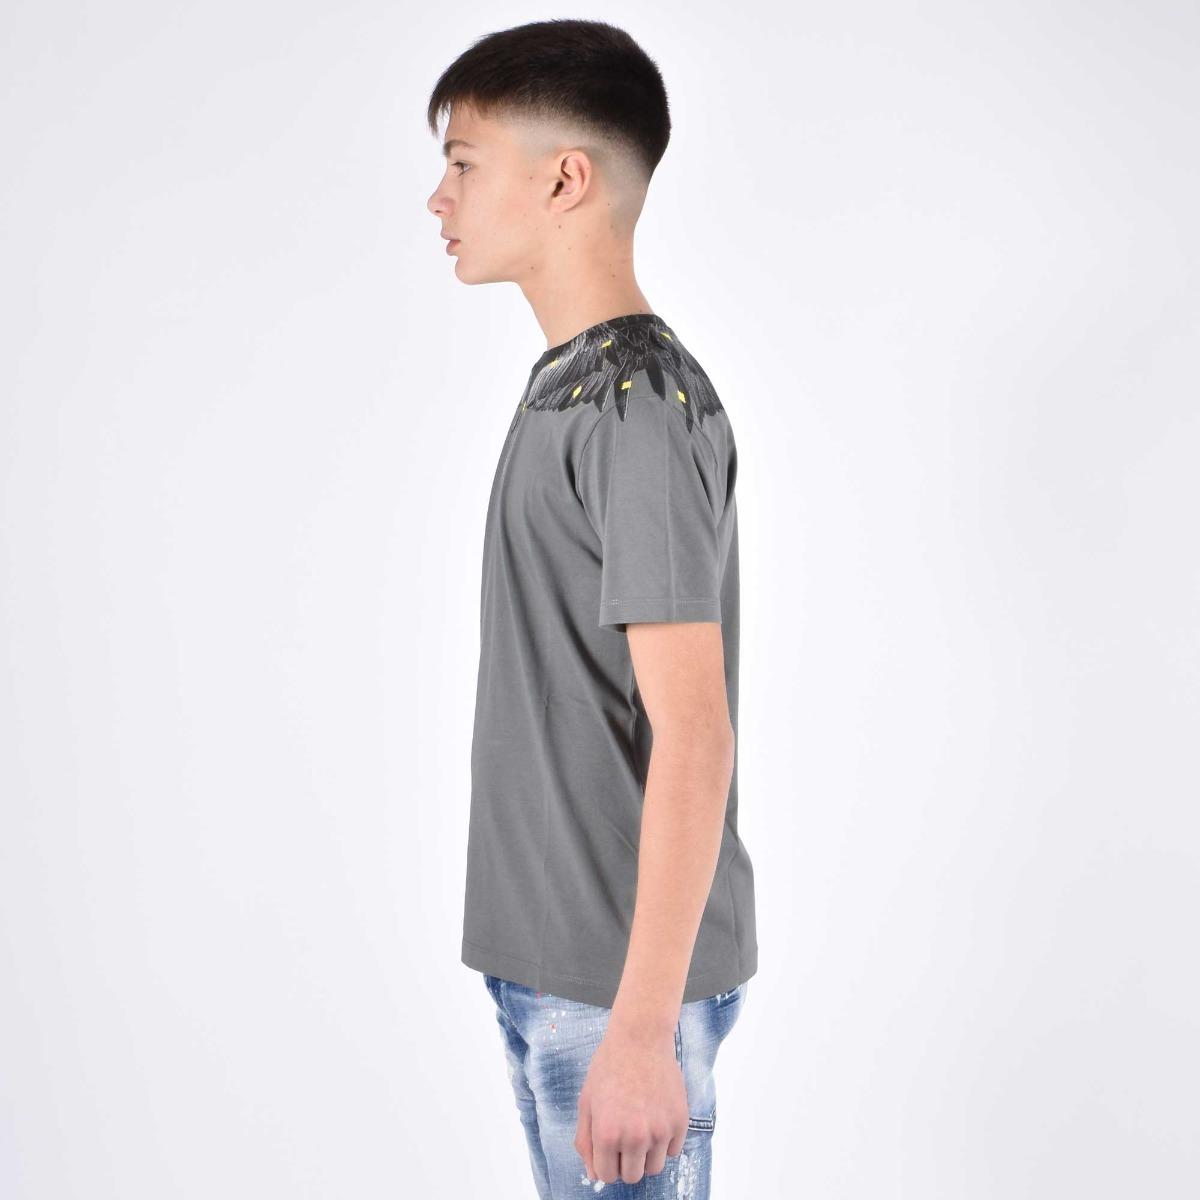 T-shirt fenice grigio - Antracite